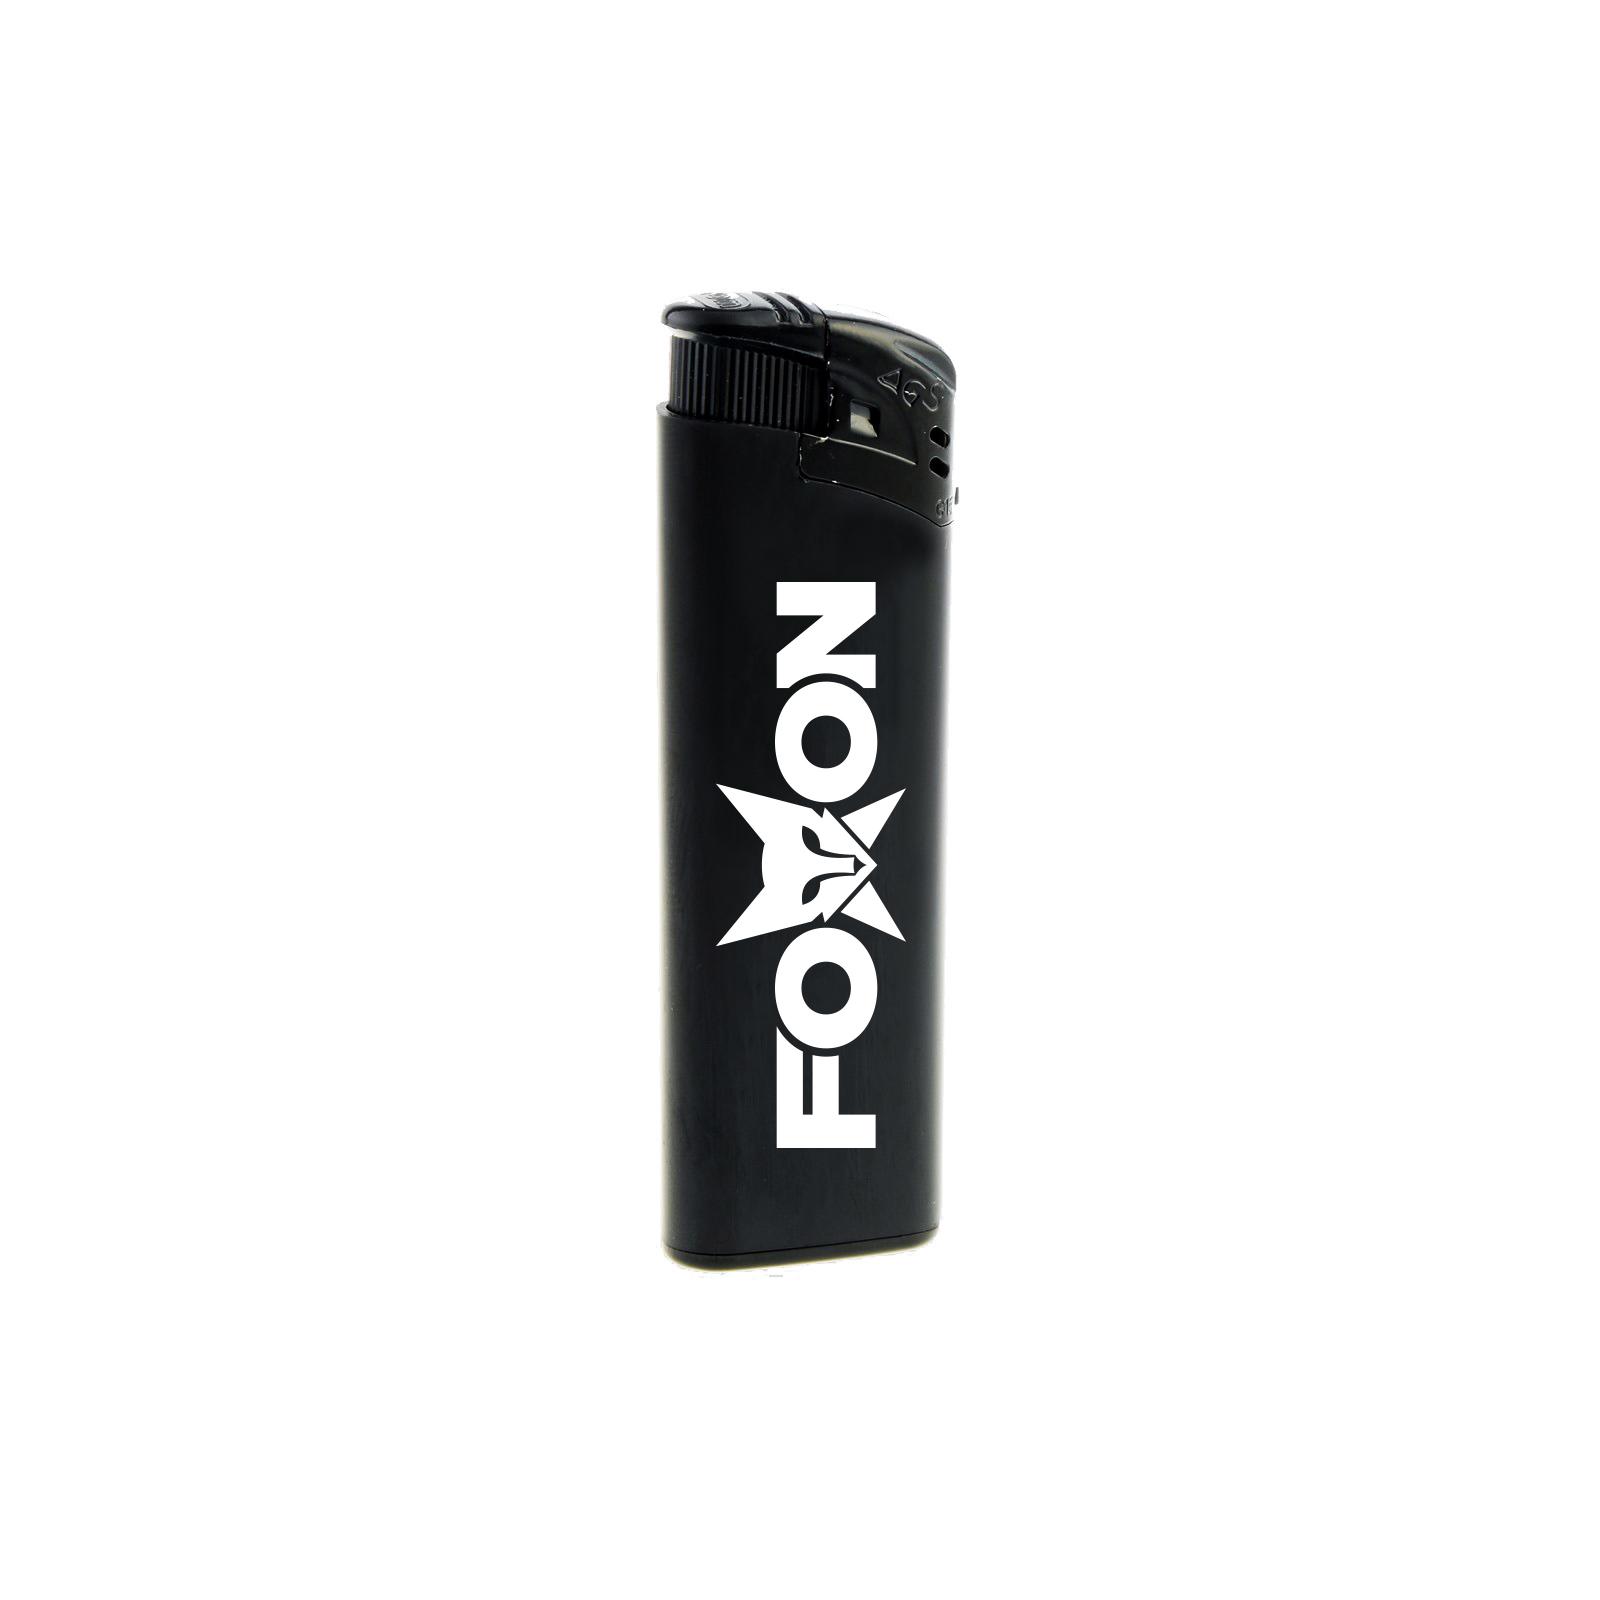 Foxon - Feuerzeug - Logo | Foxon | Merchandise | FEIERSTOFF.DE